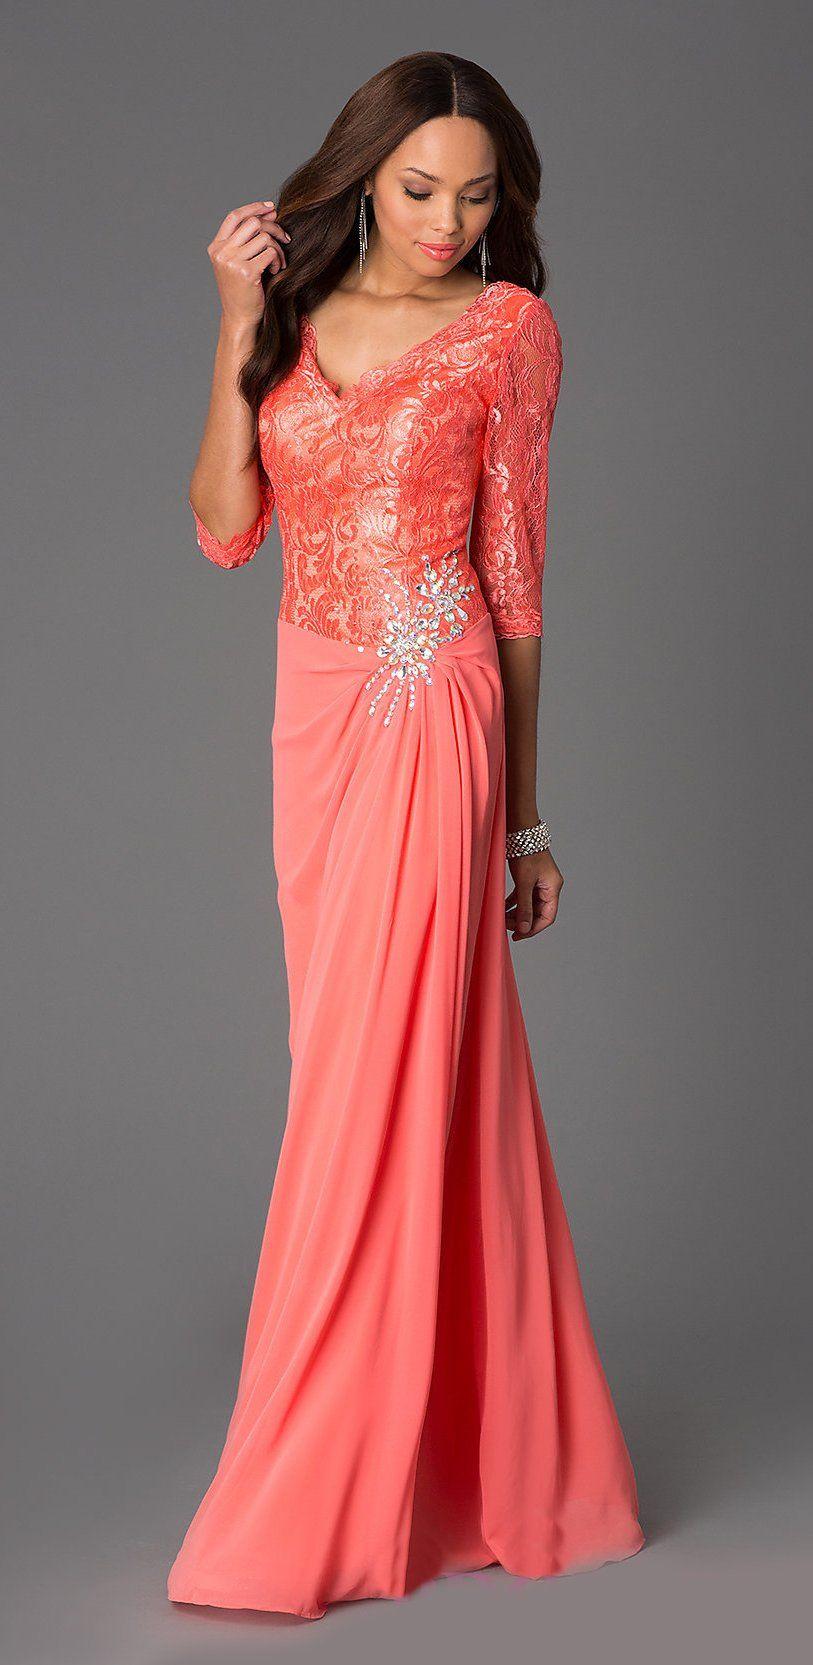 94445429ac1 V Neck Long Floor Length A Line Coral Thanksgiving Dress  224.99 ...